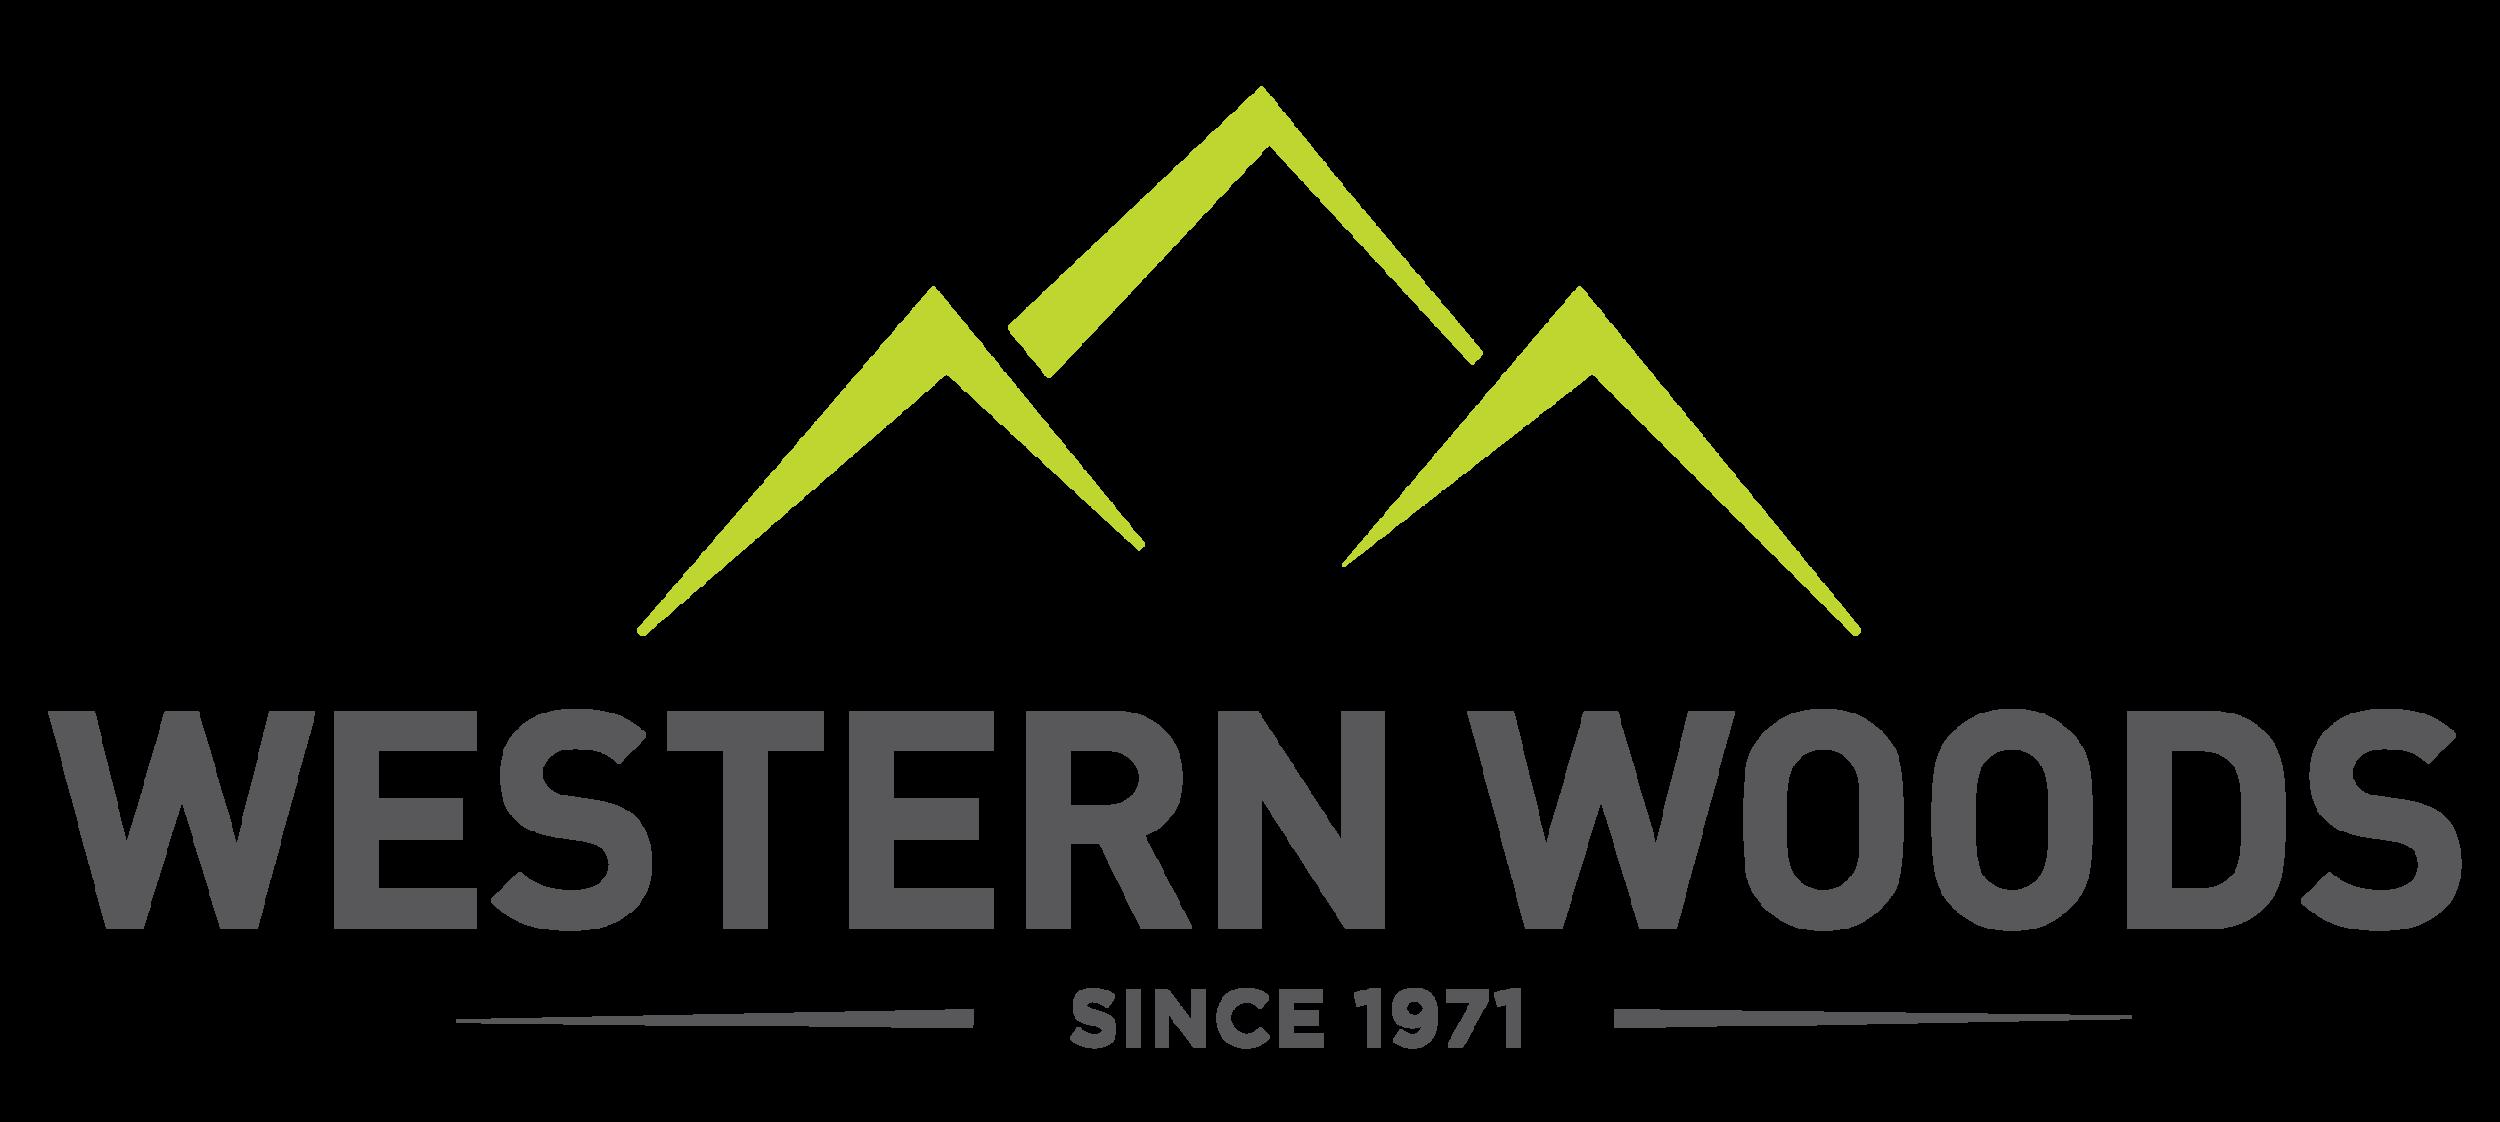 WWoods-Logomark-2018Update-061018_Hero_FullColor.png